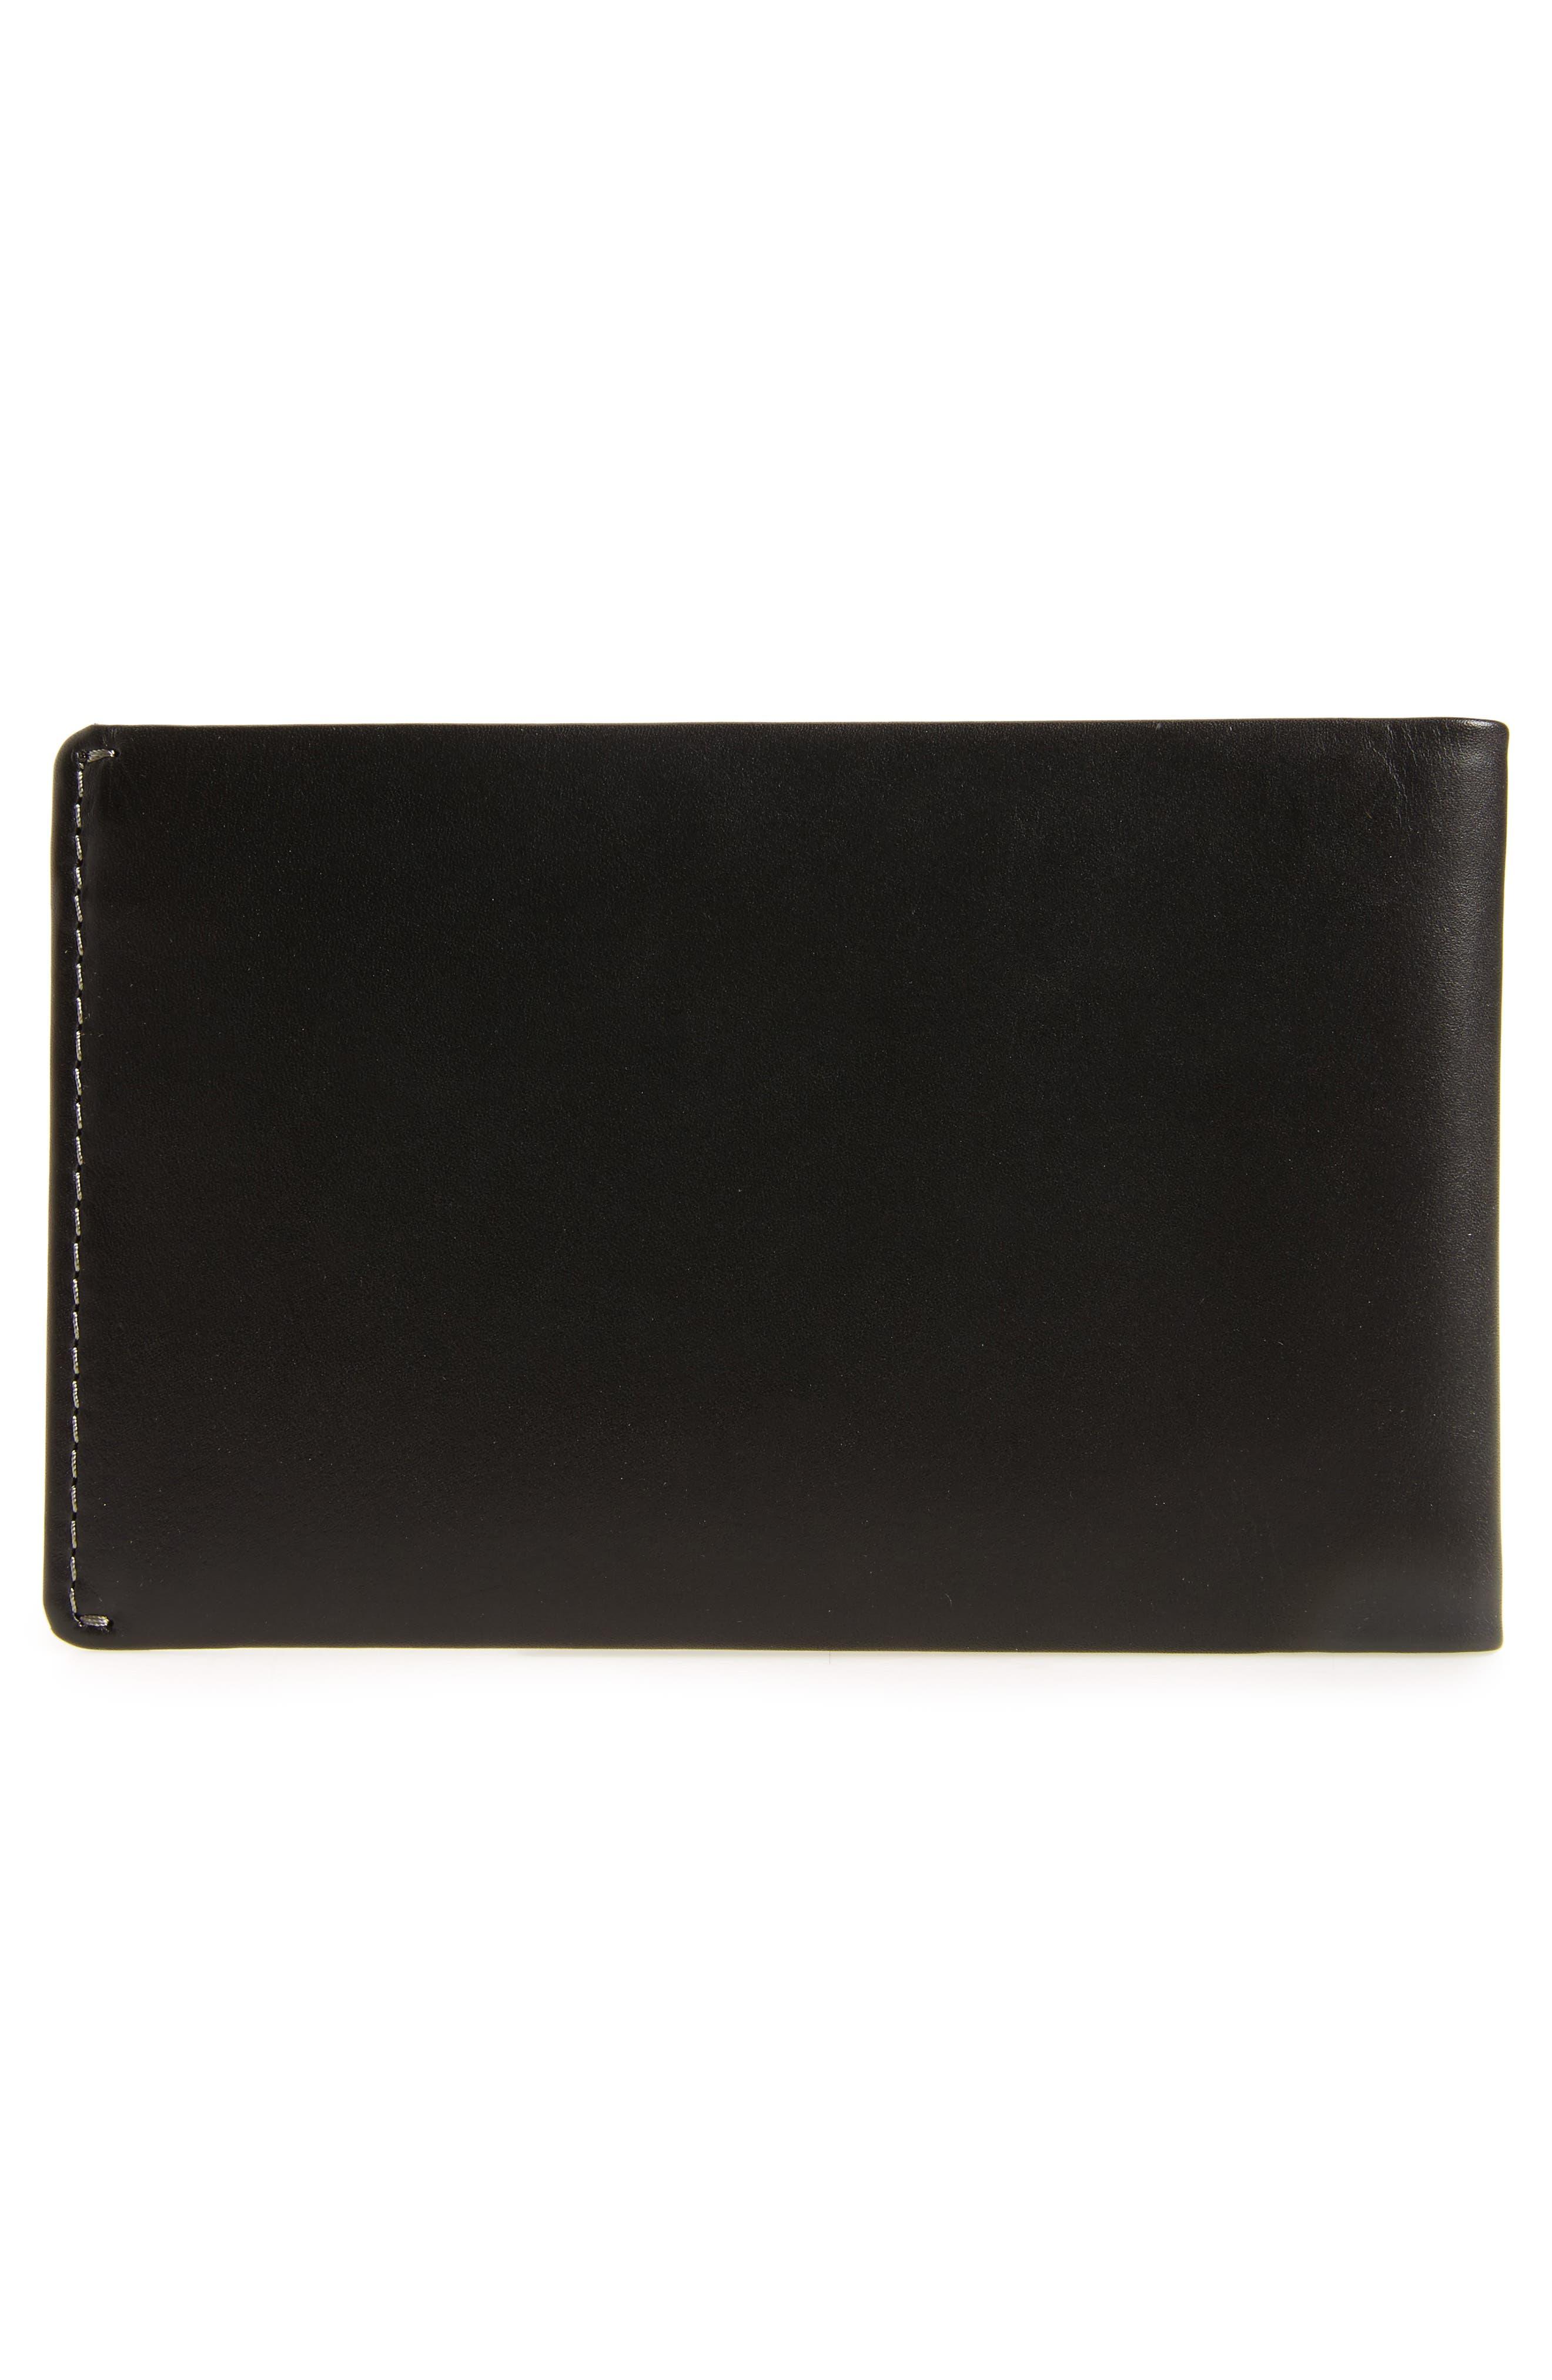 RFID Travel Wallet,                             Alternate thumbnail 3, color,                             Black